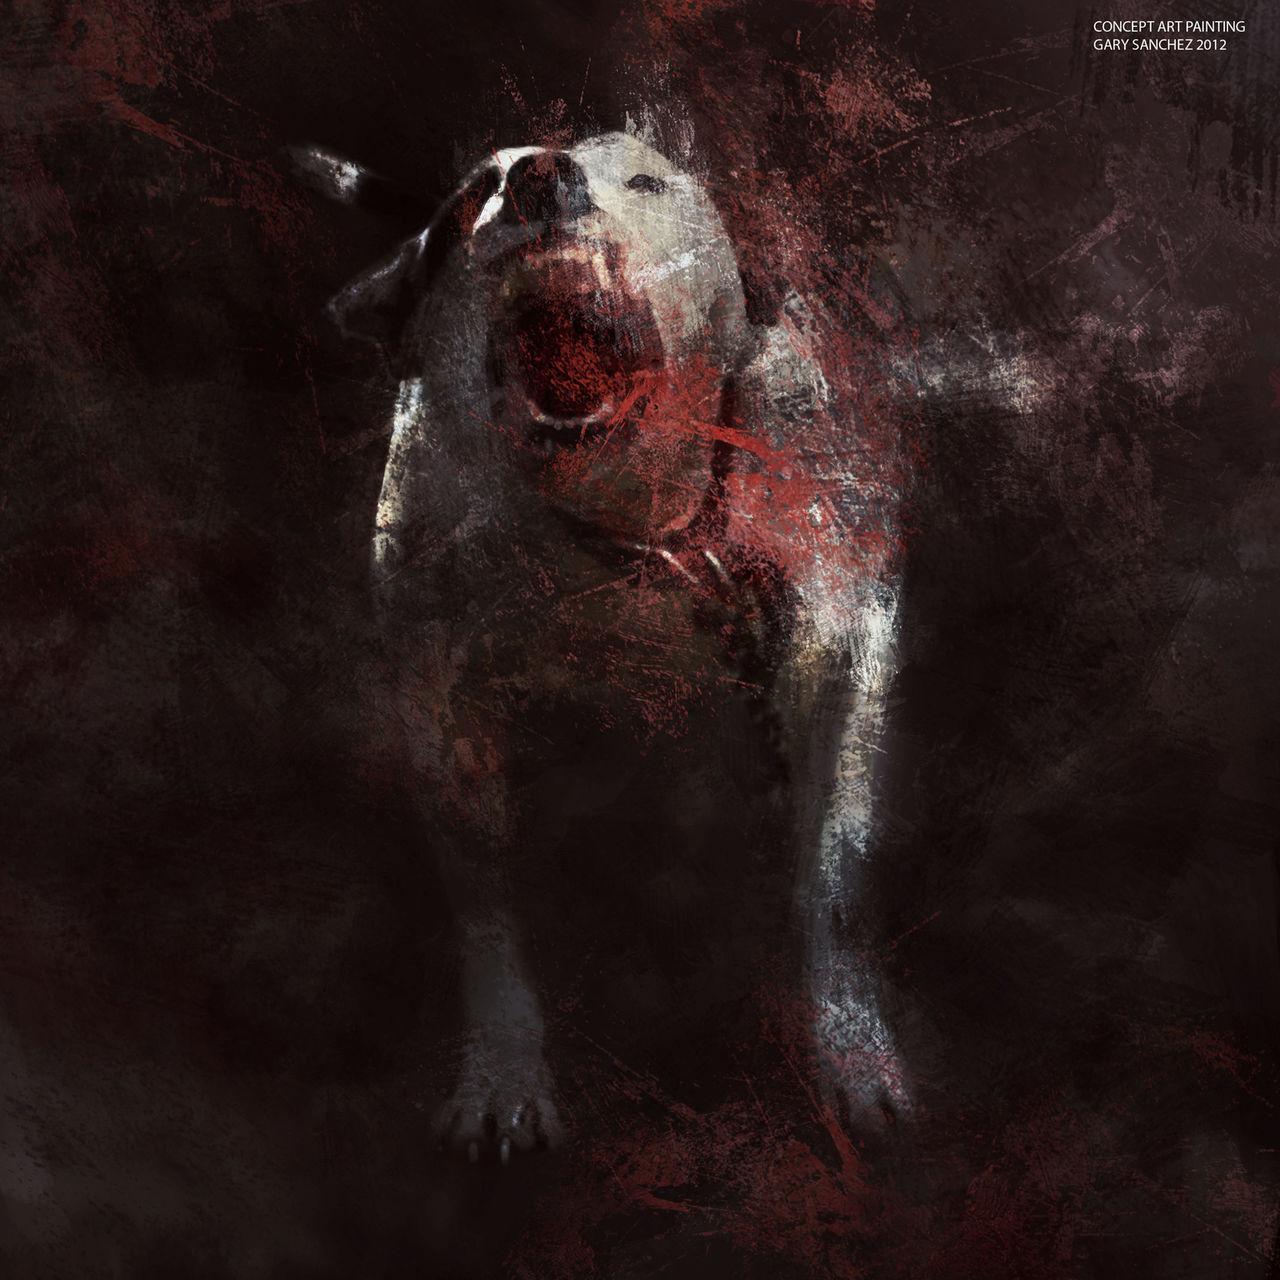 GARY SANCHEZ pitbull 001